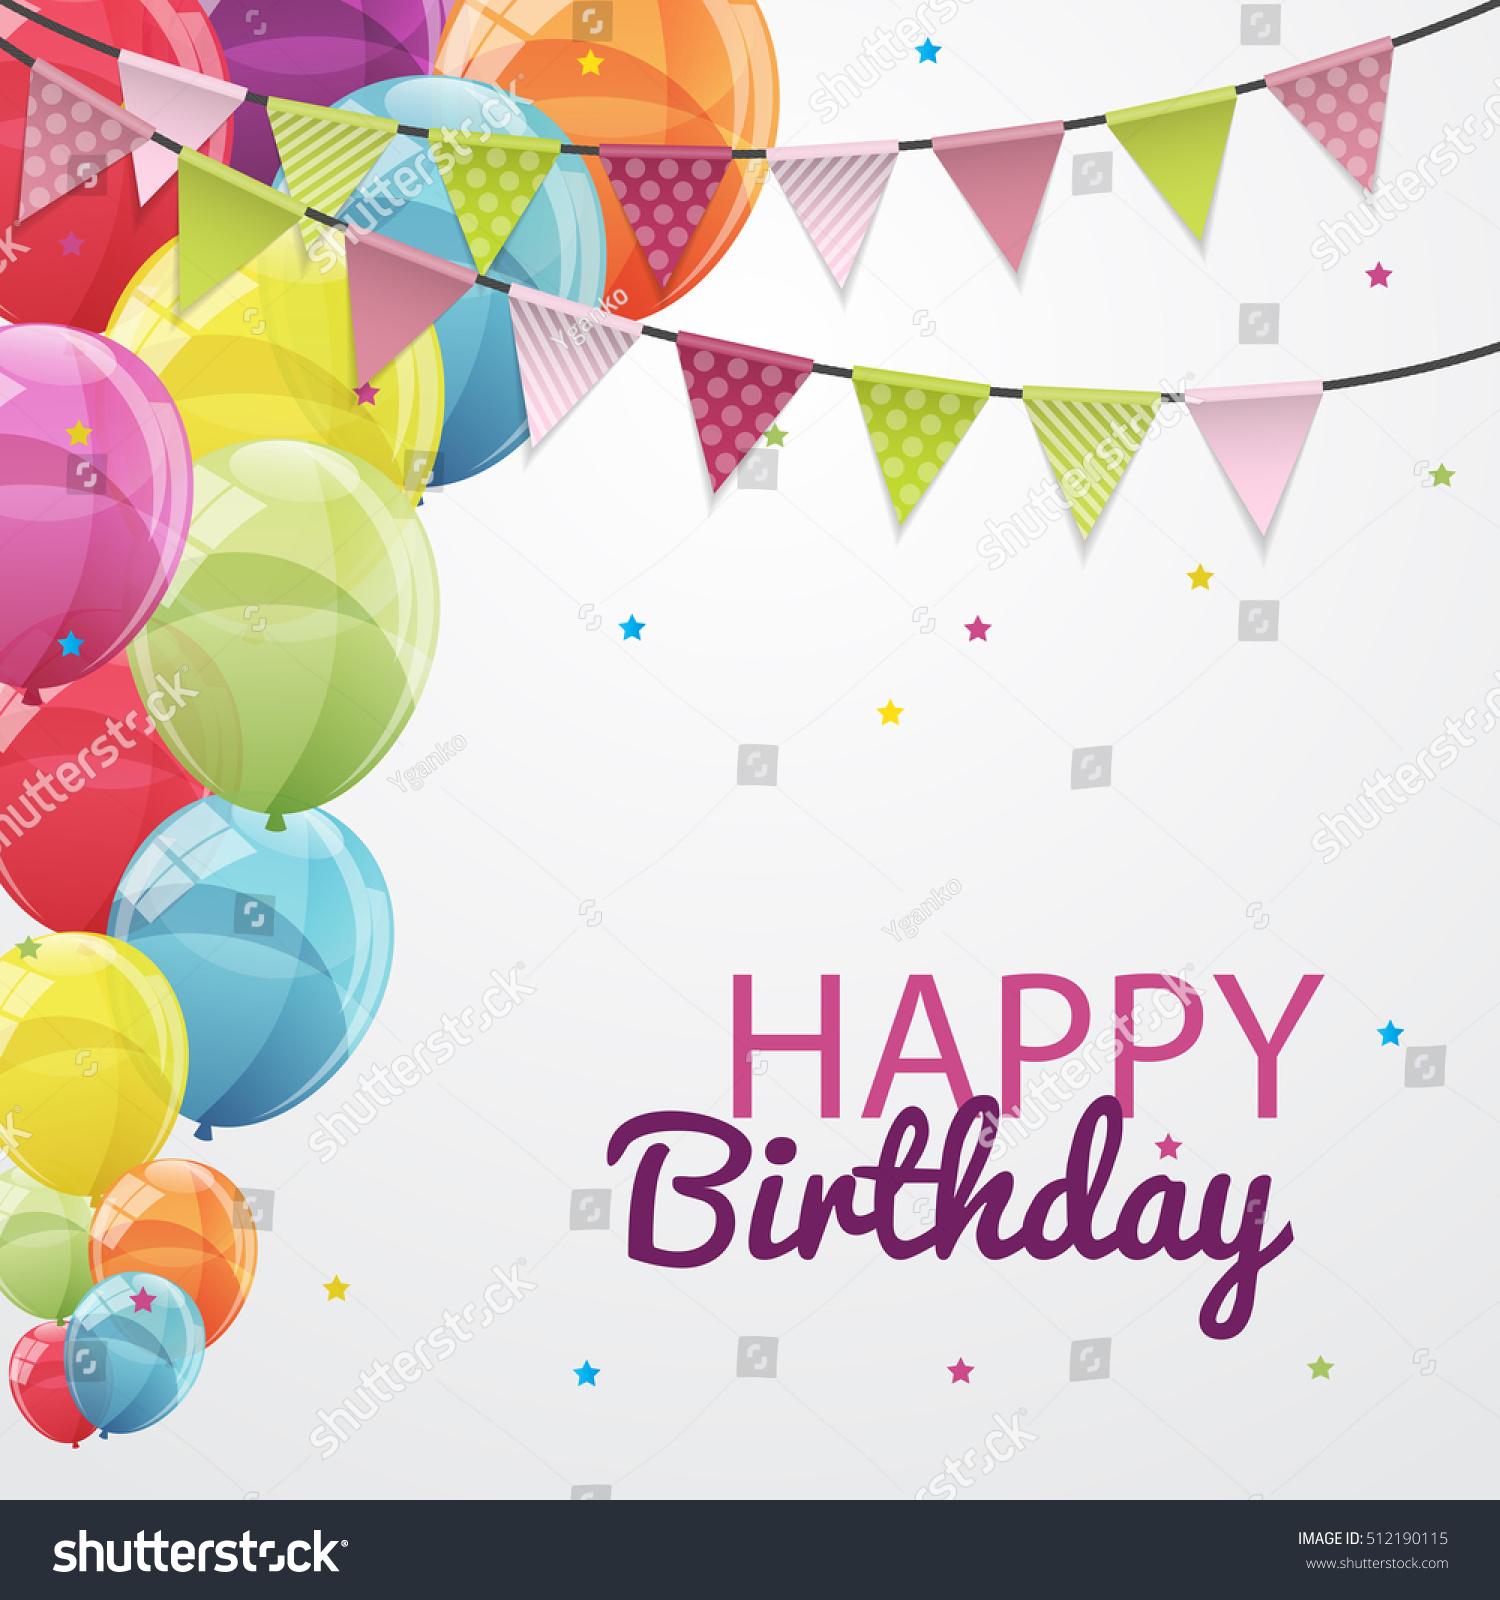 Happy Birthday Card Template Free Birthday Cards